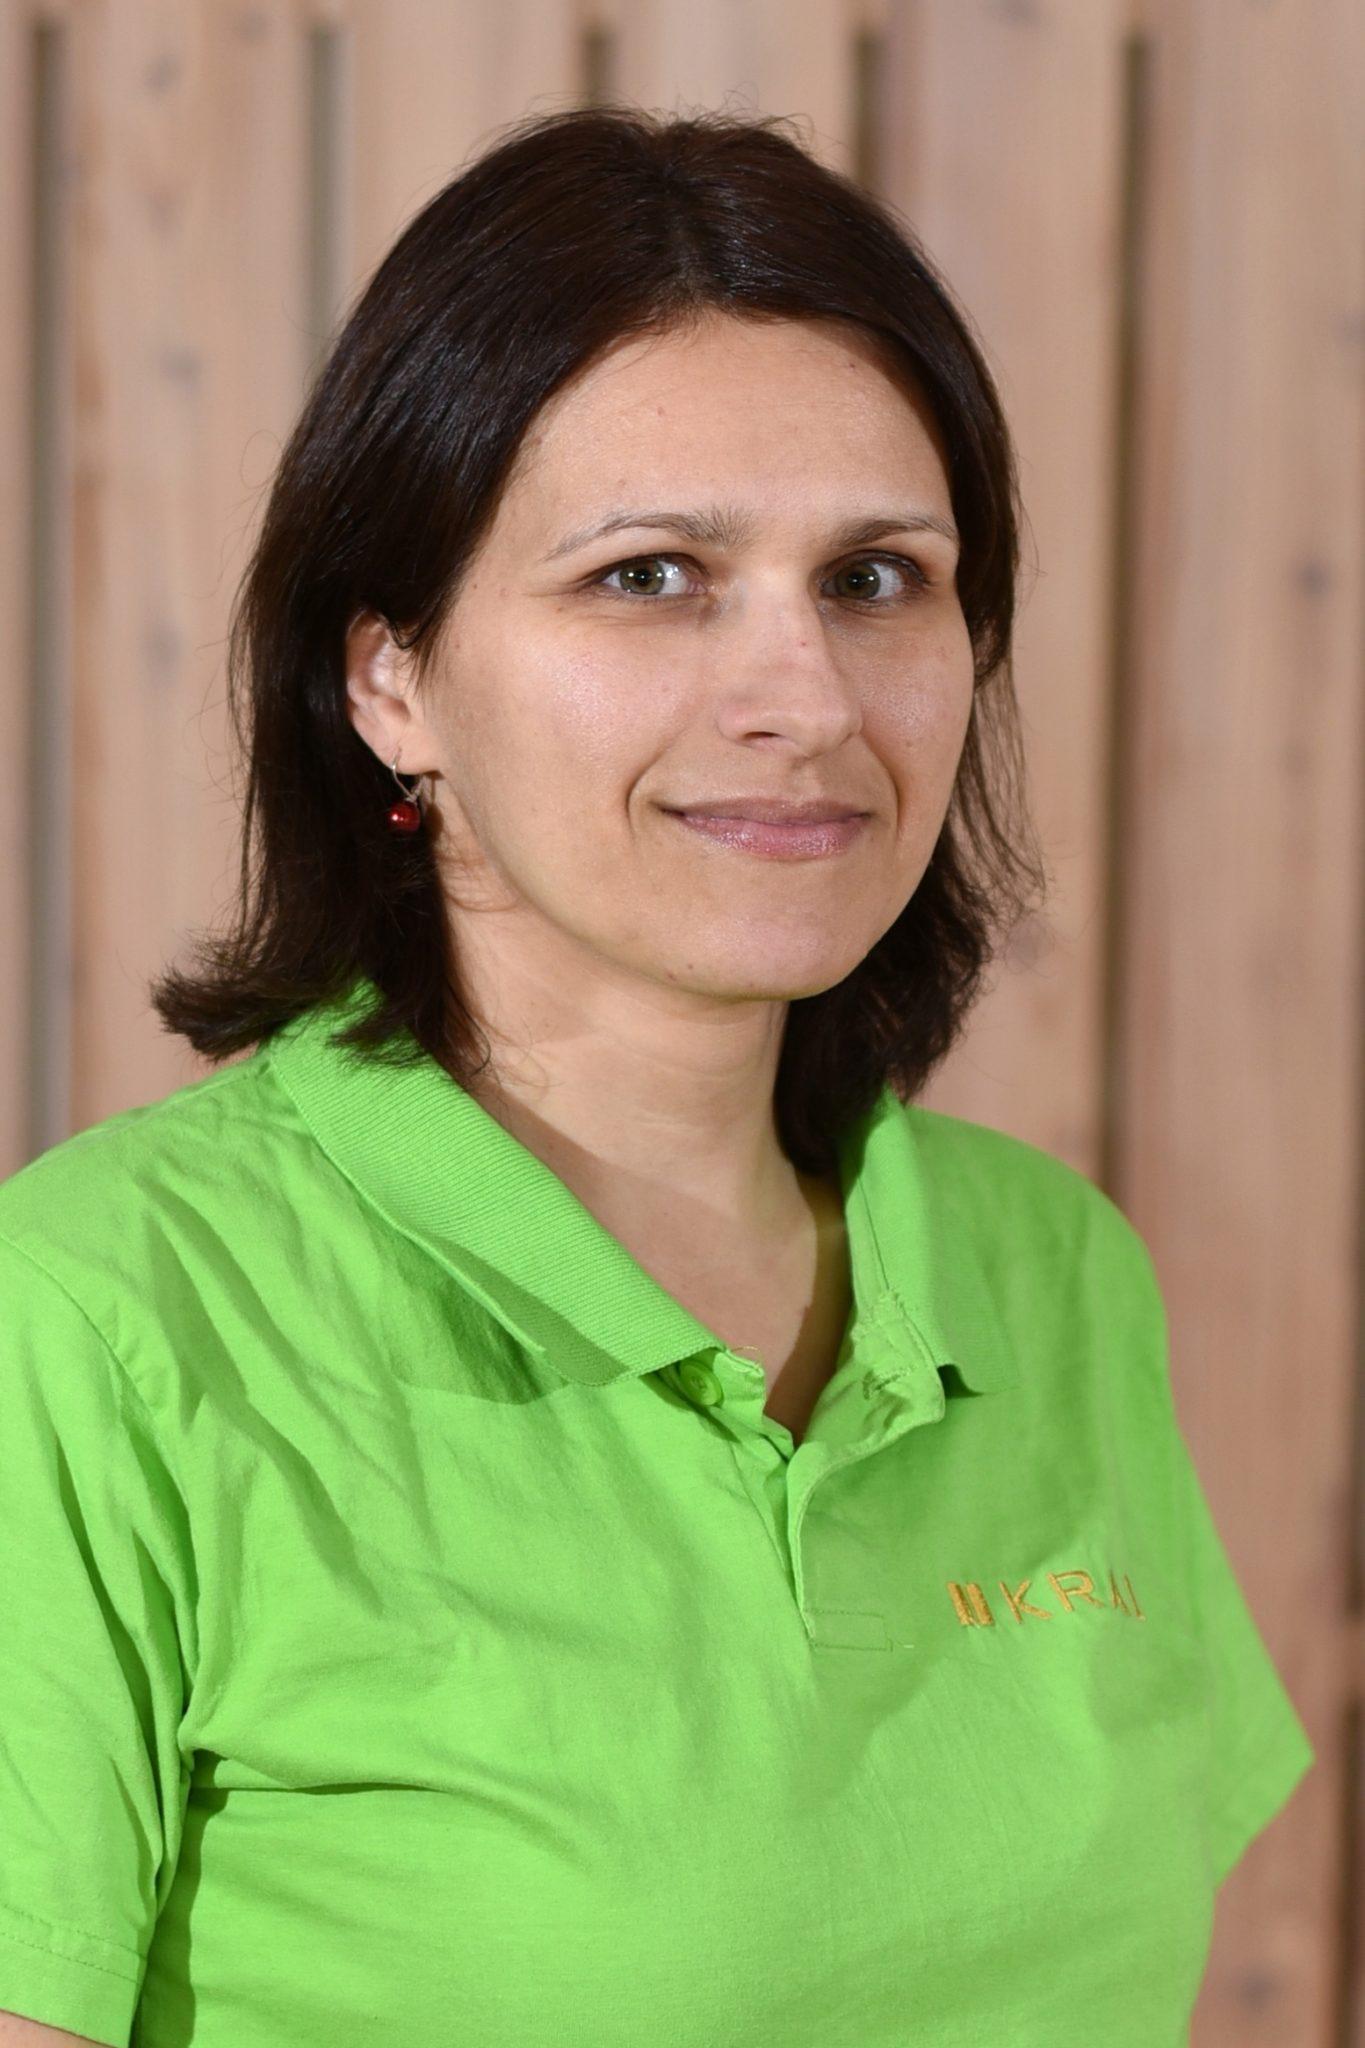 Zuzana Simonidesová